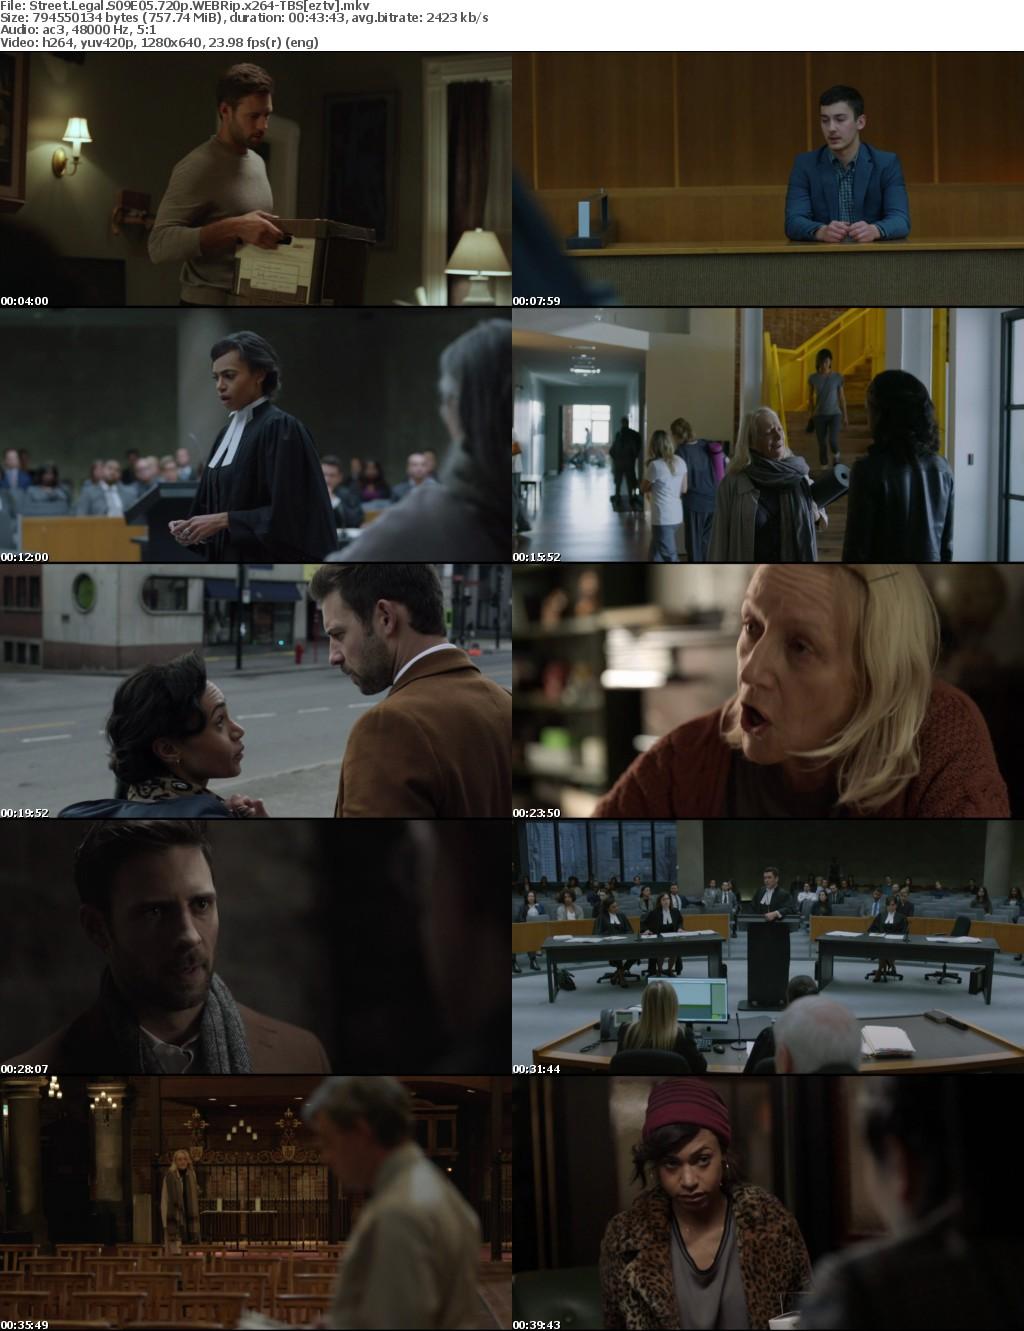 Street Legal S09E05 720p WEBRip x264-TBS